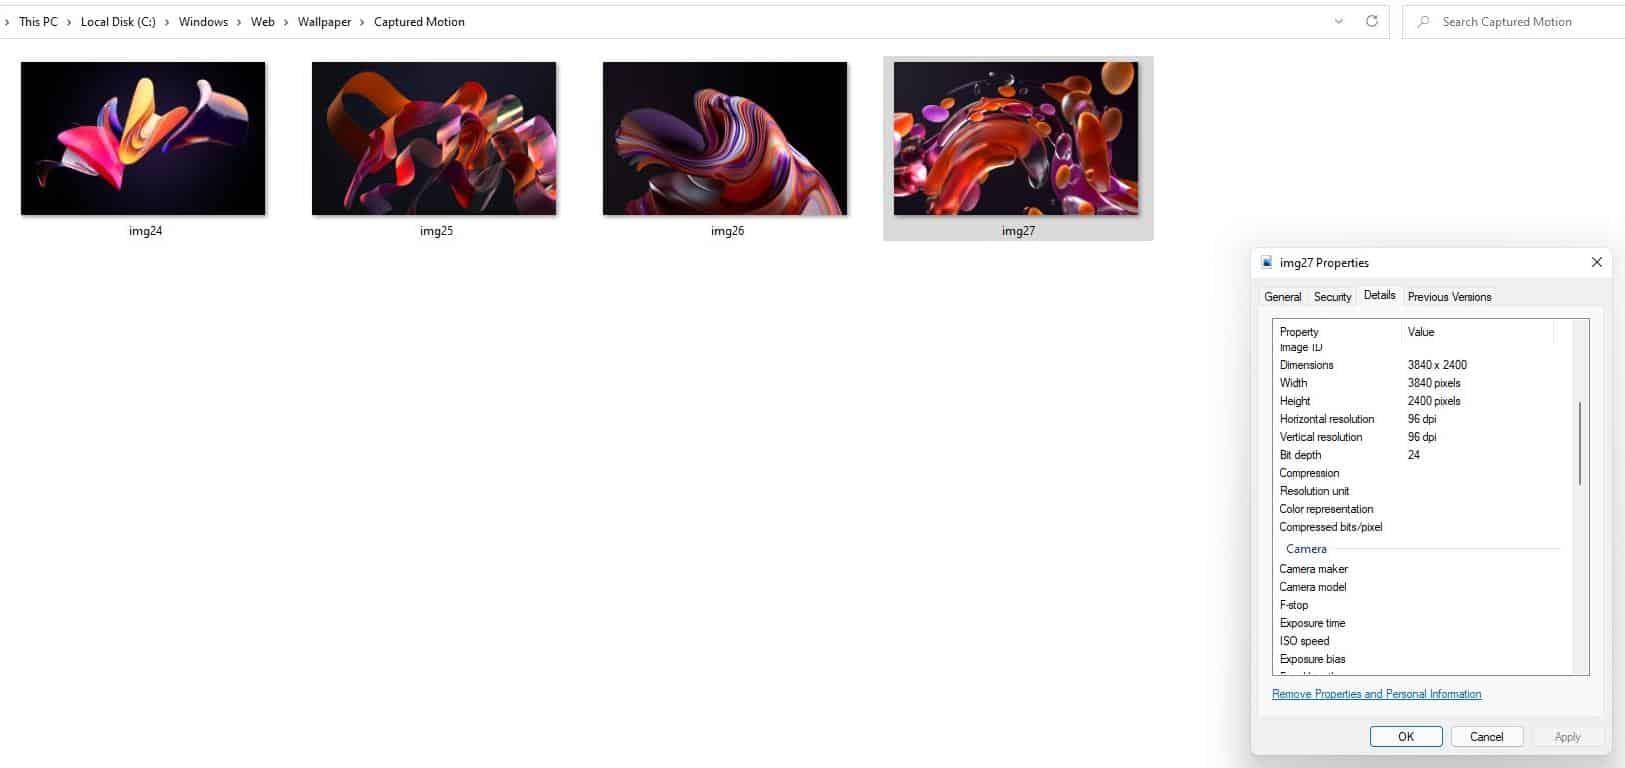 Windows 11 wallpapers - captured motion folder